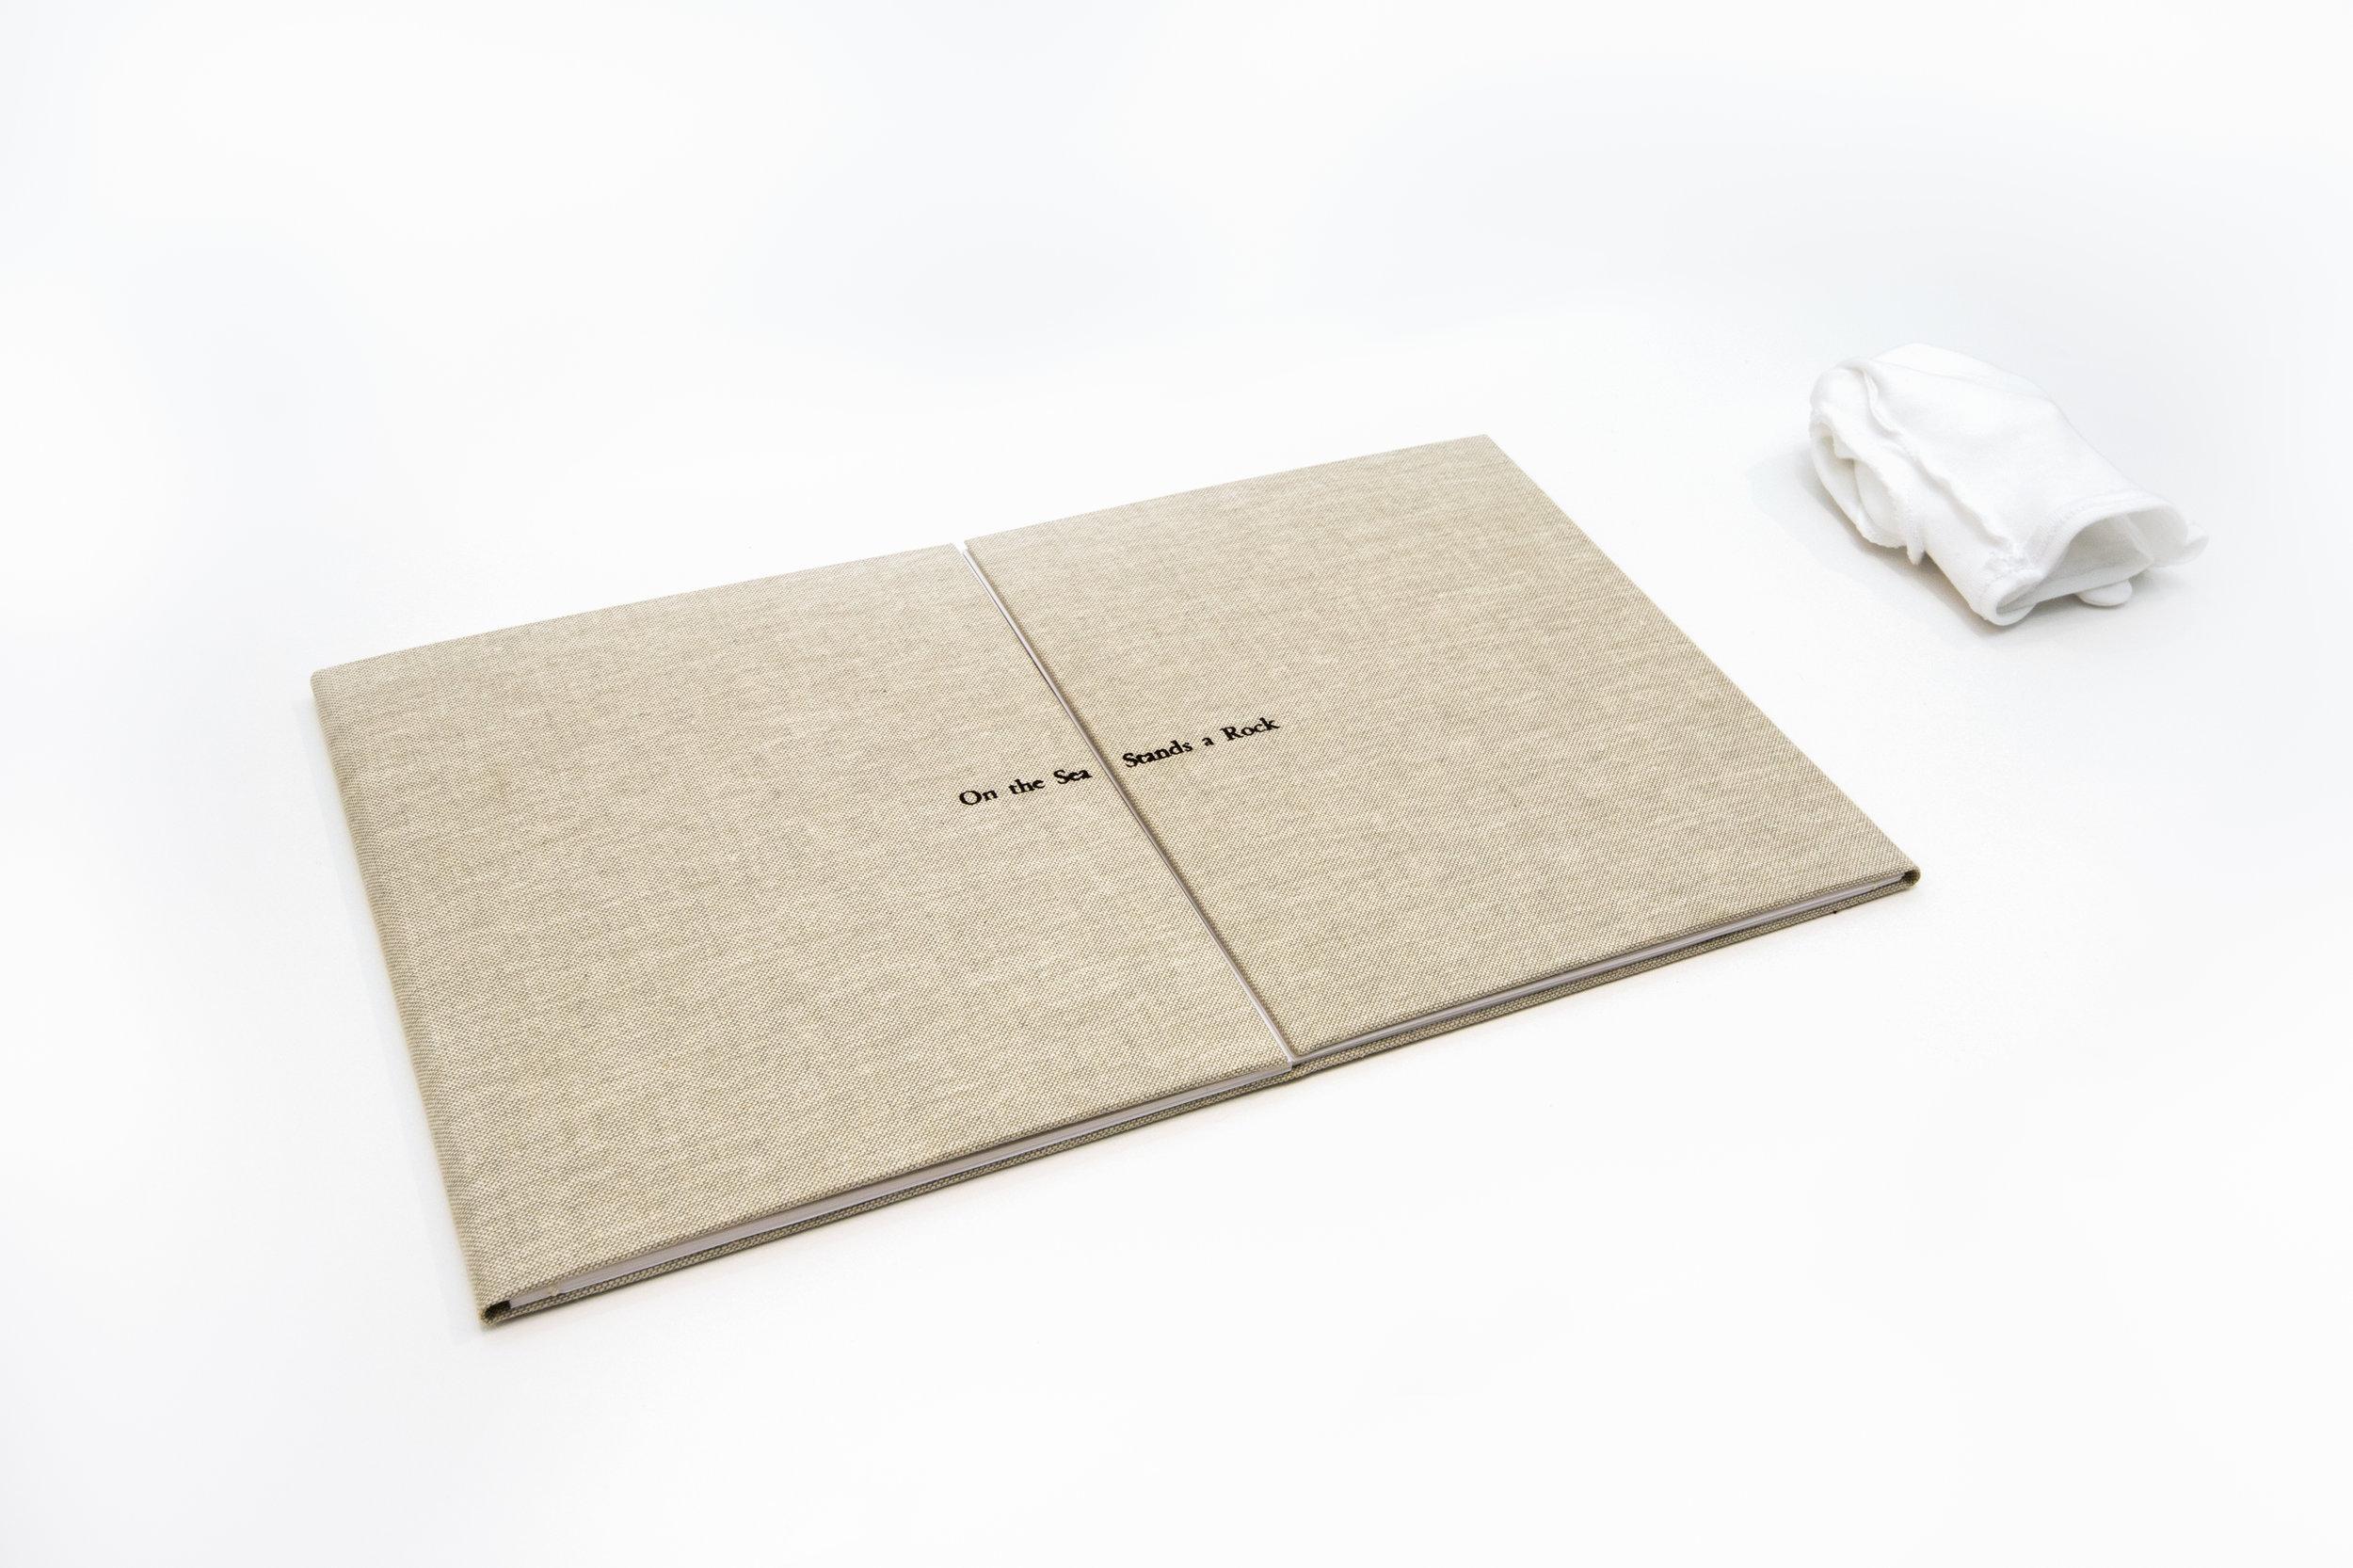 Photobook - Handmade First Edition - 10 copies